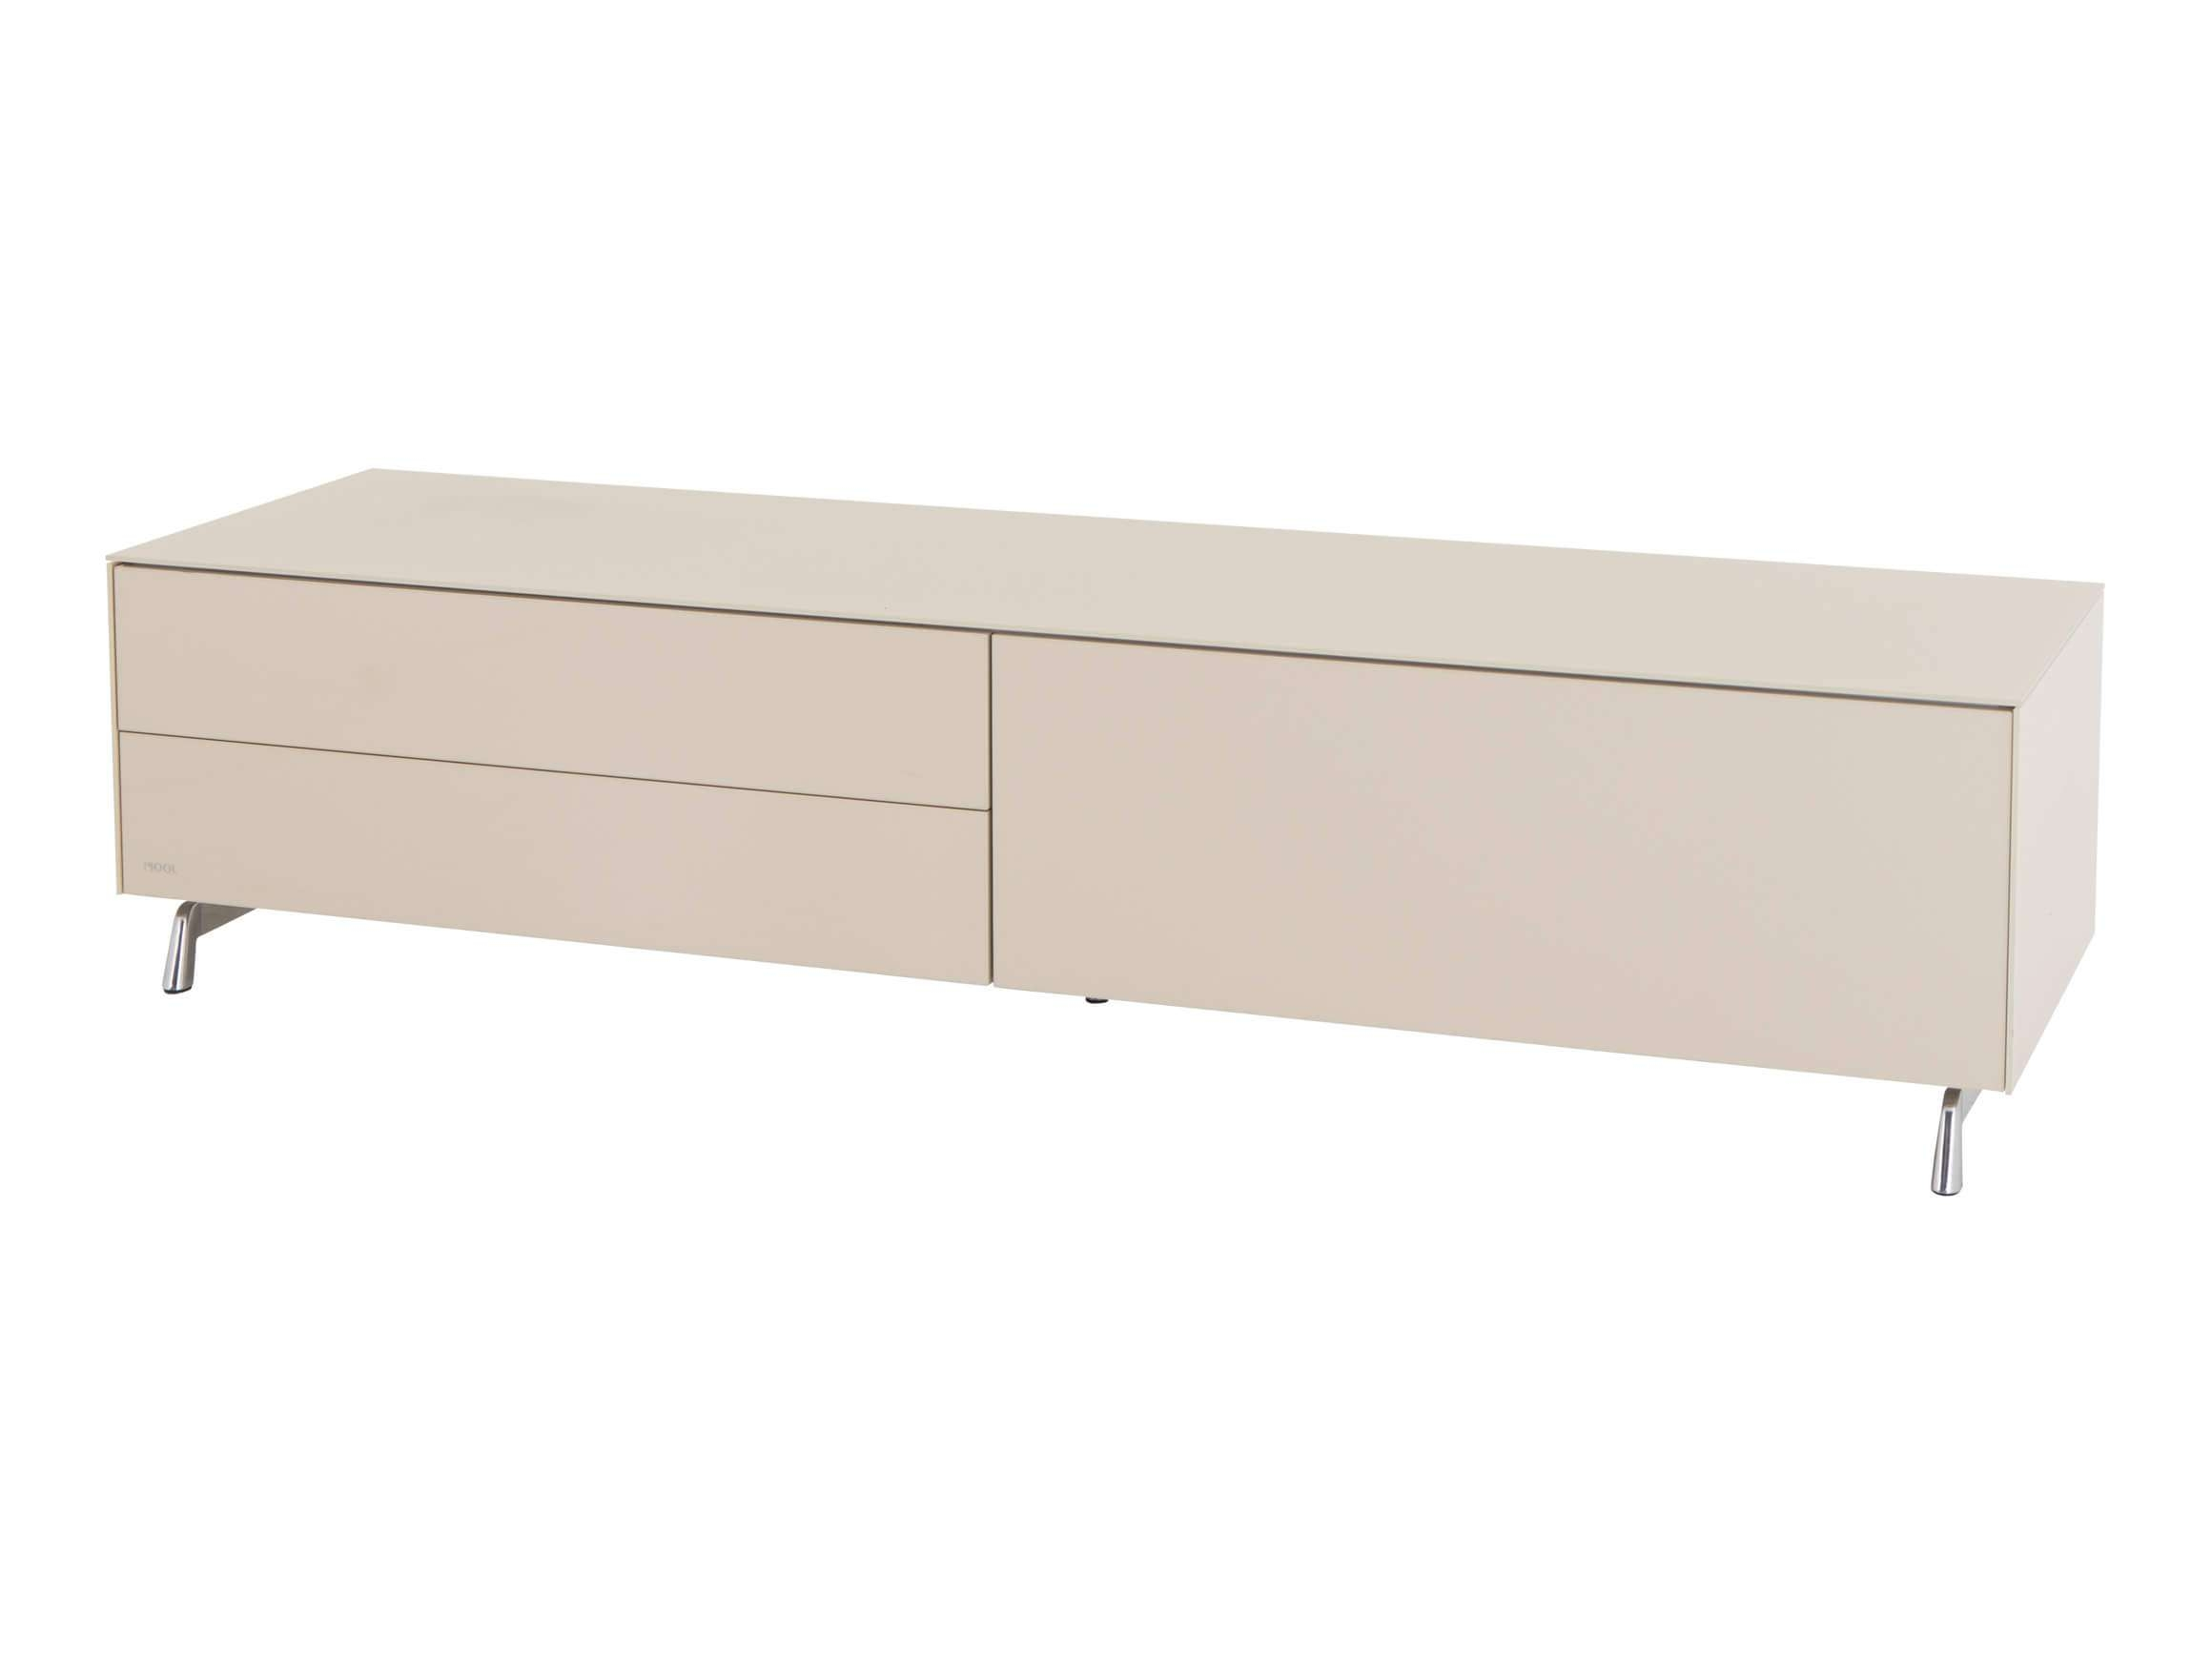 Lowboard Loft, 2 Schubladen, Beleuchtung, B 202 Cm H 47 Cm T 57 Cm Inside Joop Sideboards (View 5 of 20)